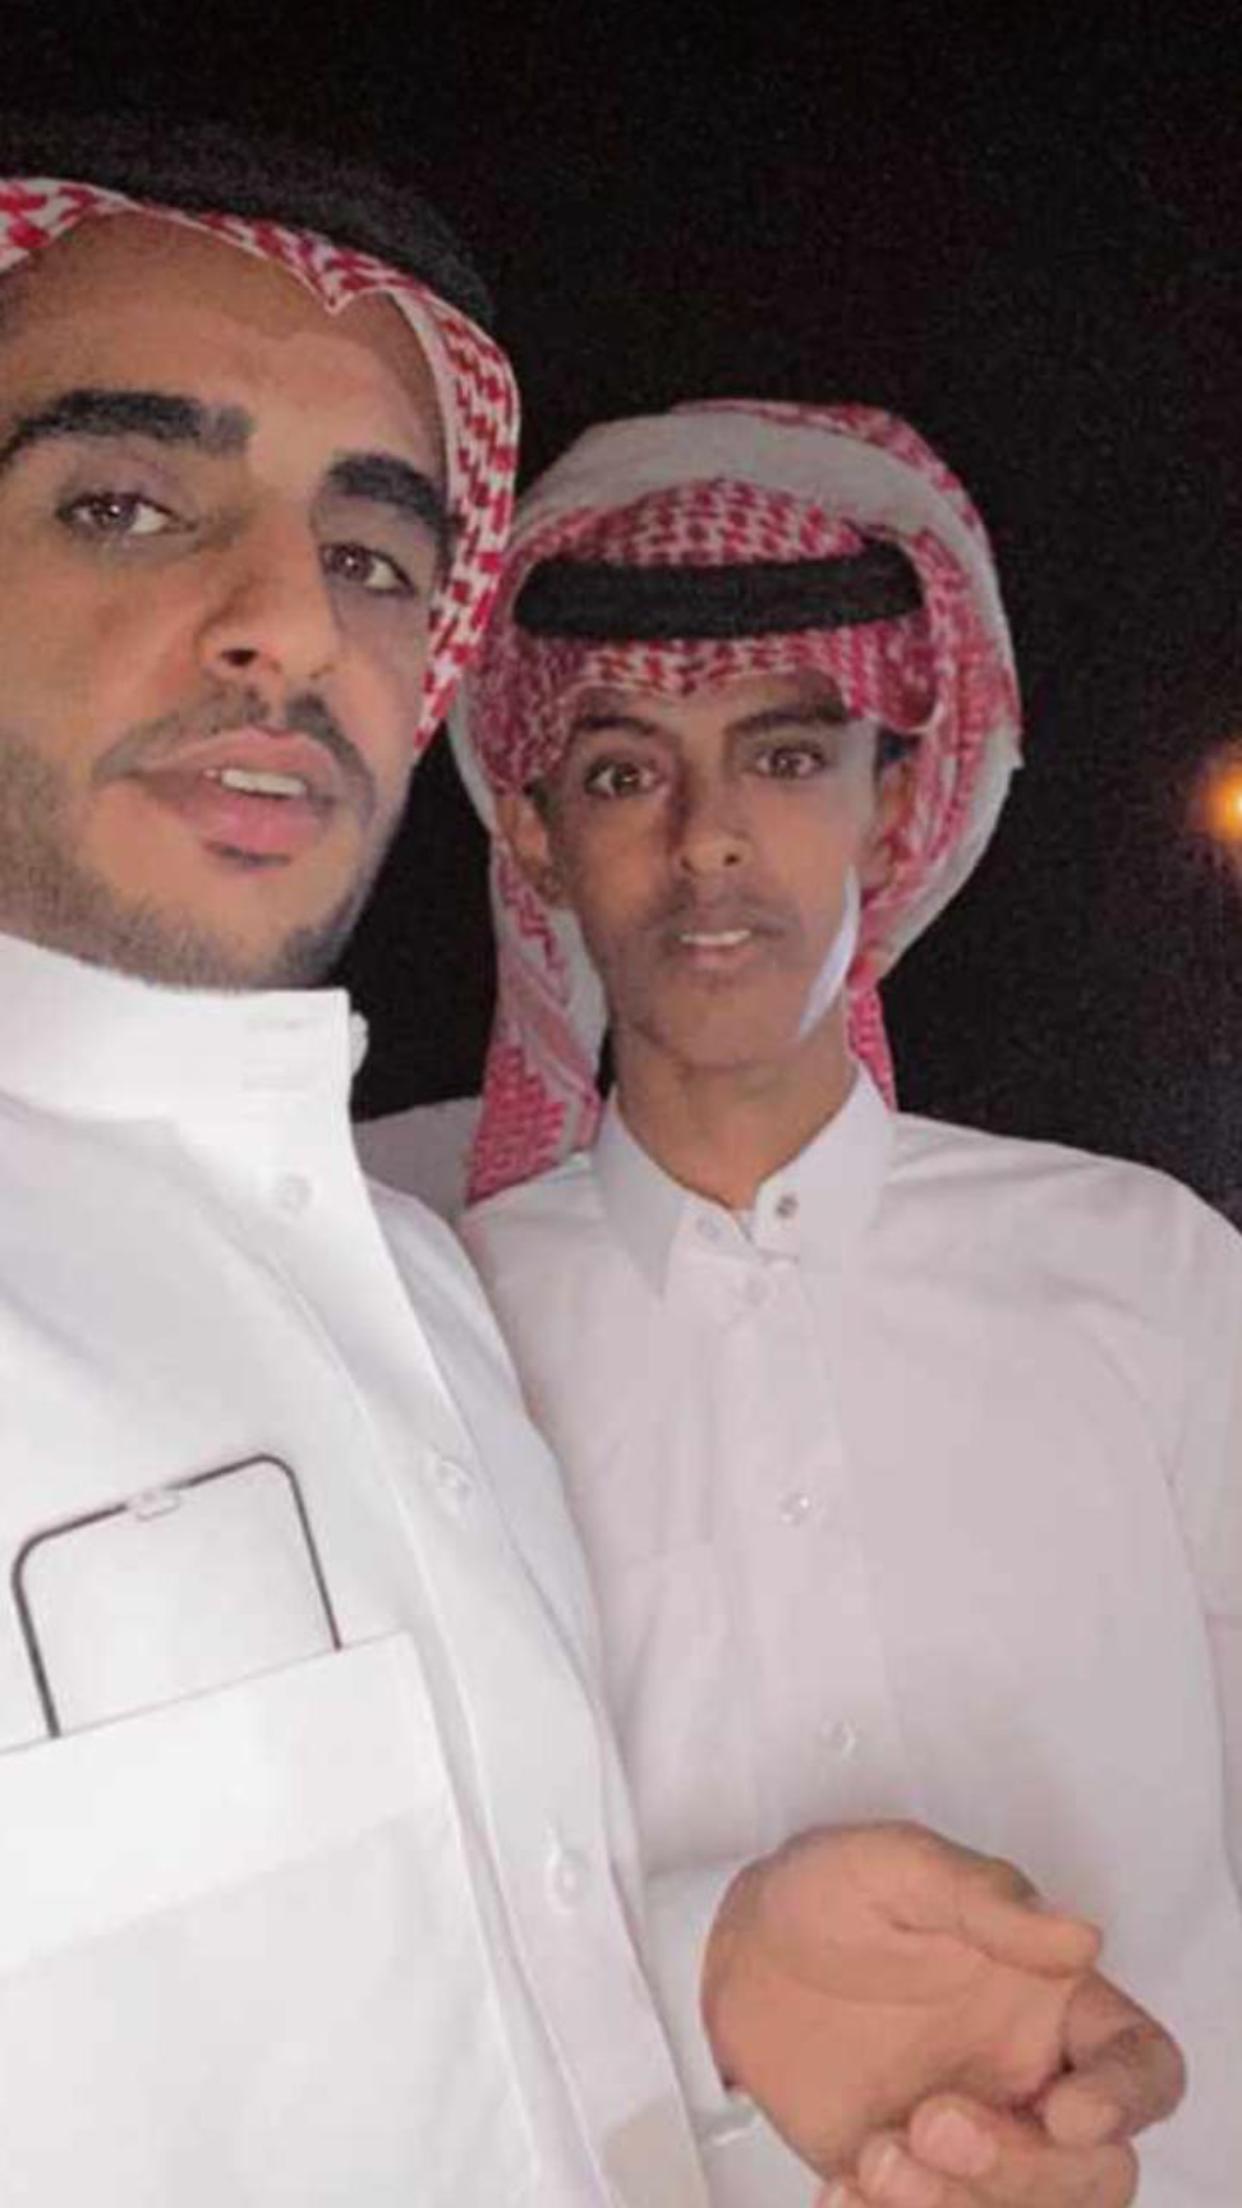 الشاب / حمدان فرج الجحم البلوي يحتفل بزواجه E4302915 934E 474A B63F 9E1E0193FF5C